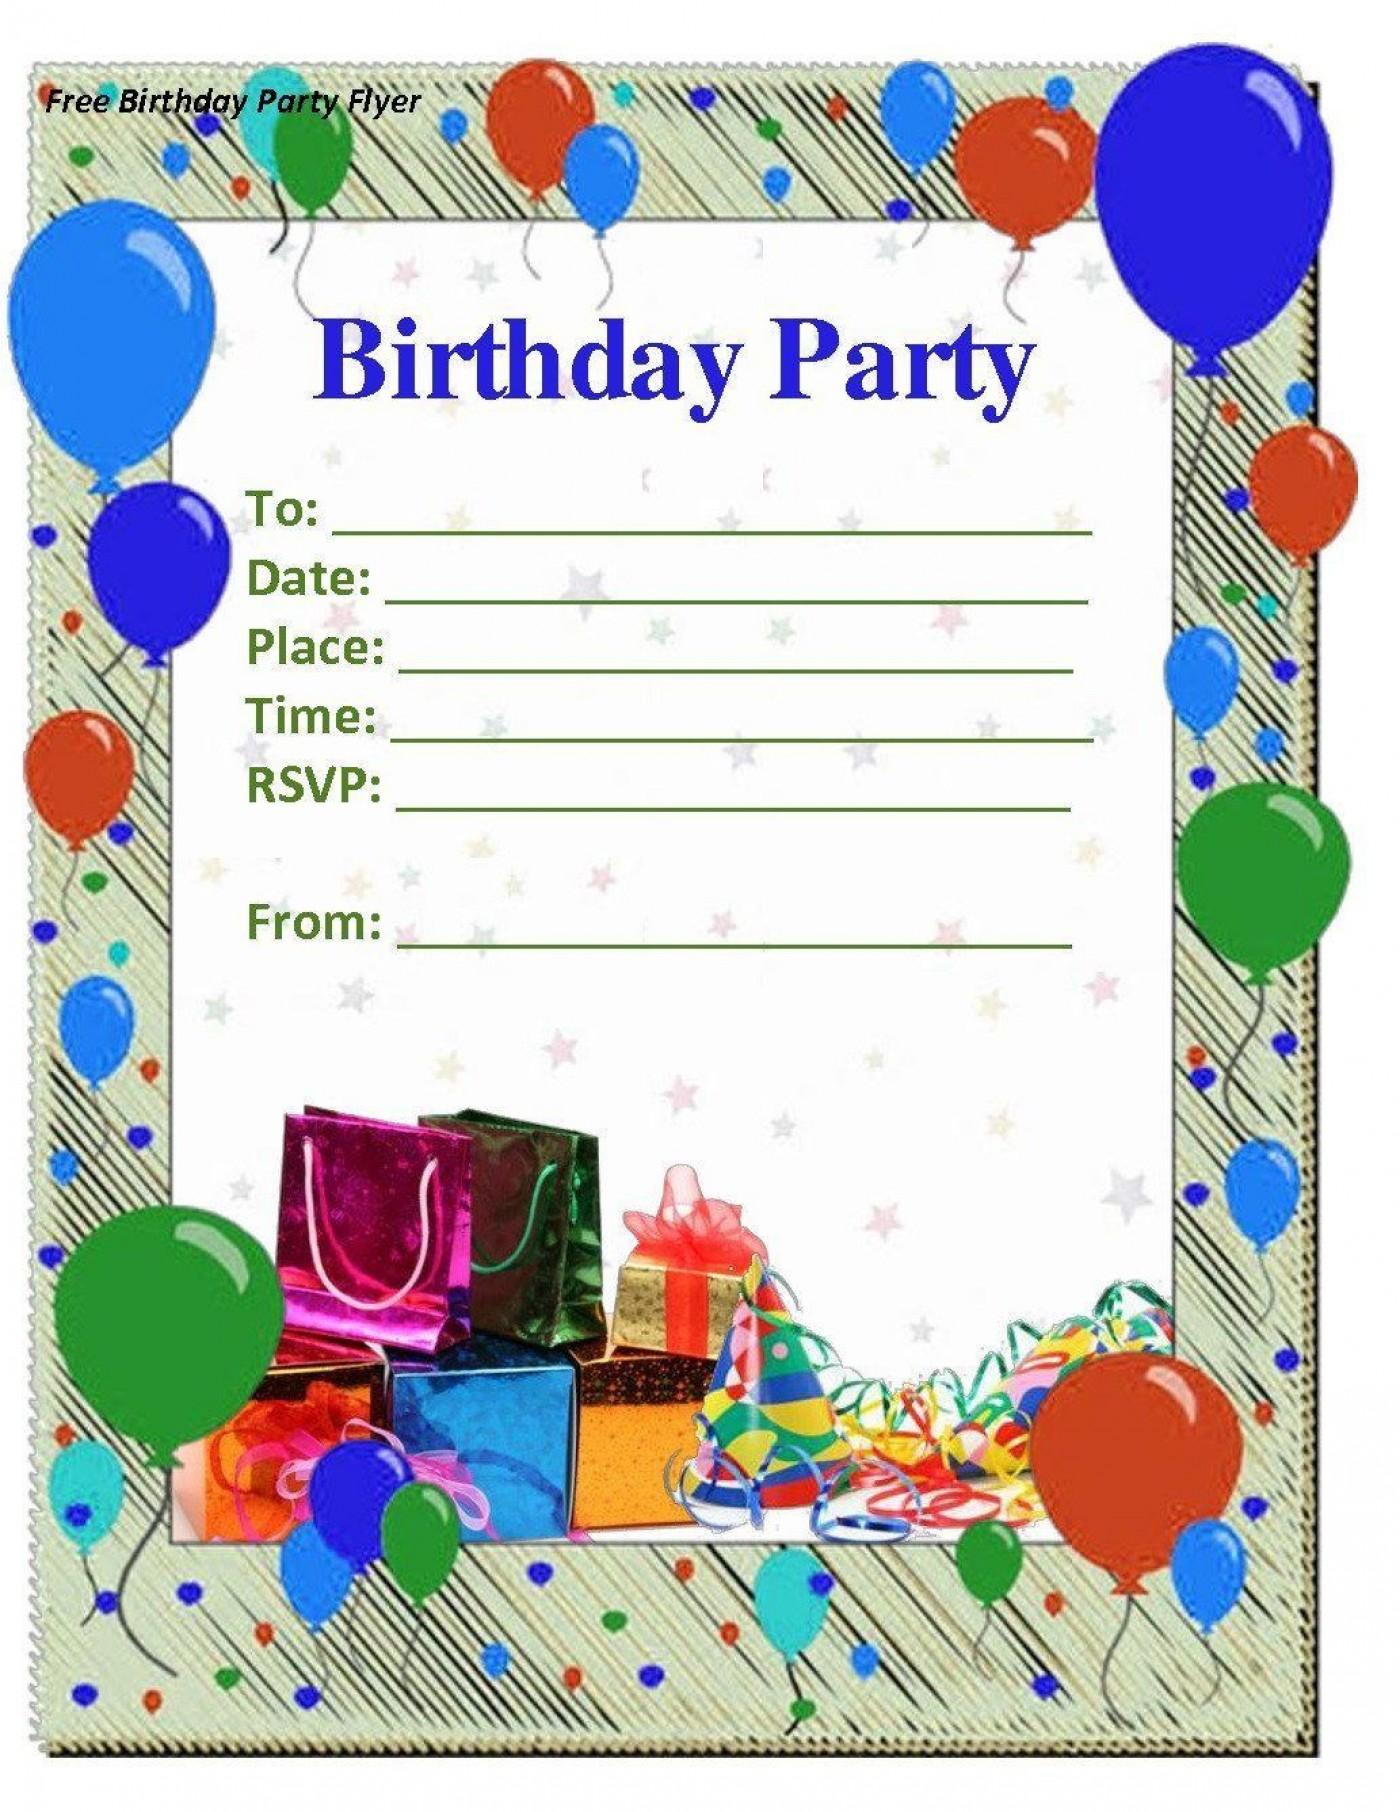 008 Amazing Microsoft Word Birthday Invitation Template Idea  Editable 50th 60th1400